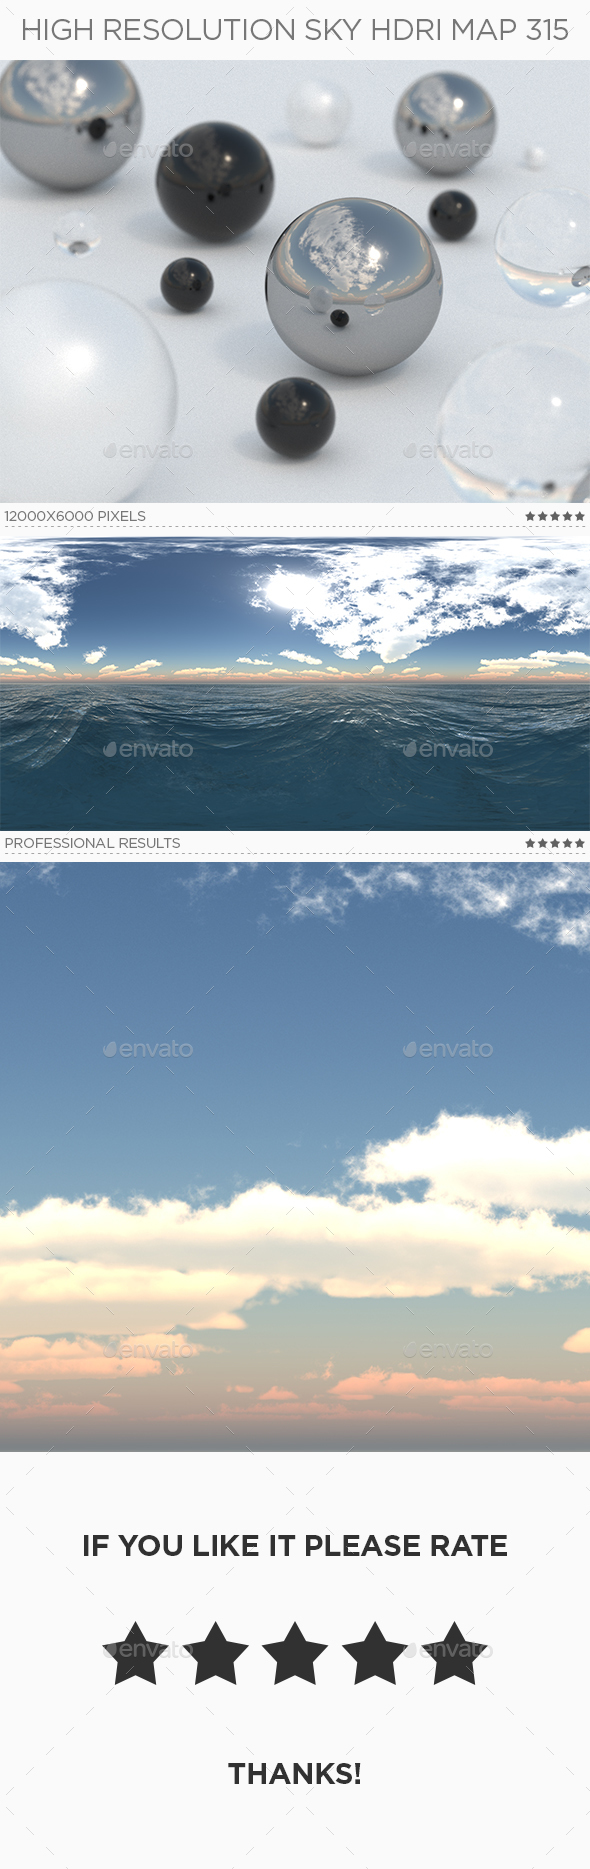 High Resolution Sky HDRi Map 315 - 3DOcean Item for Sale